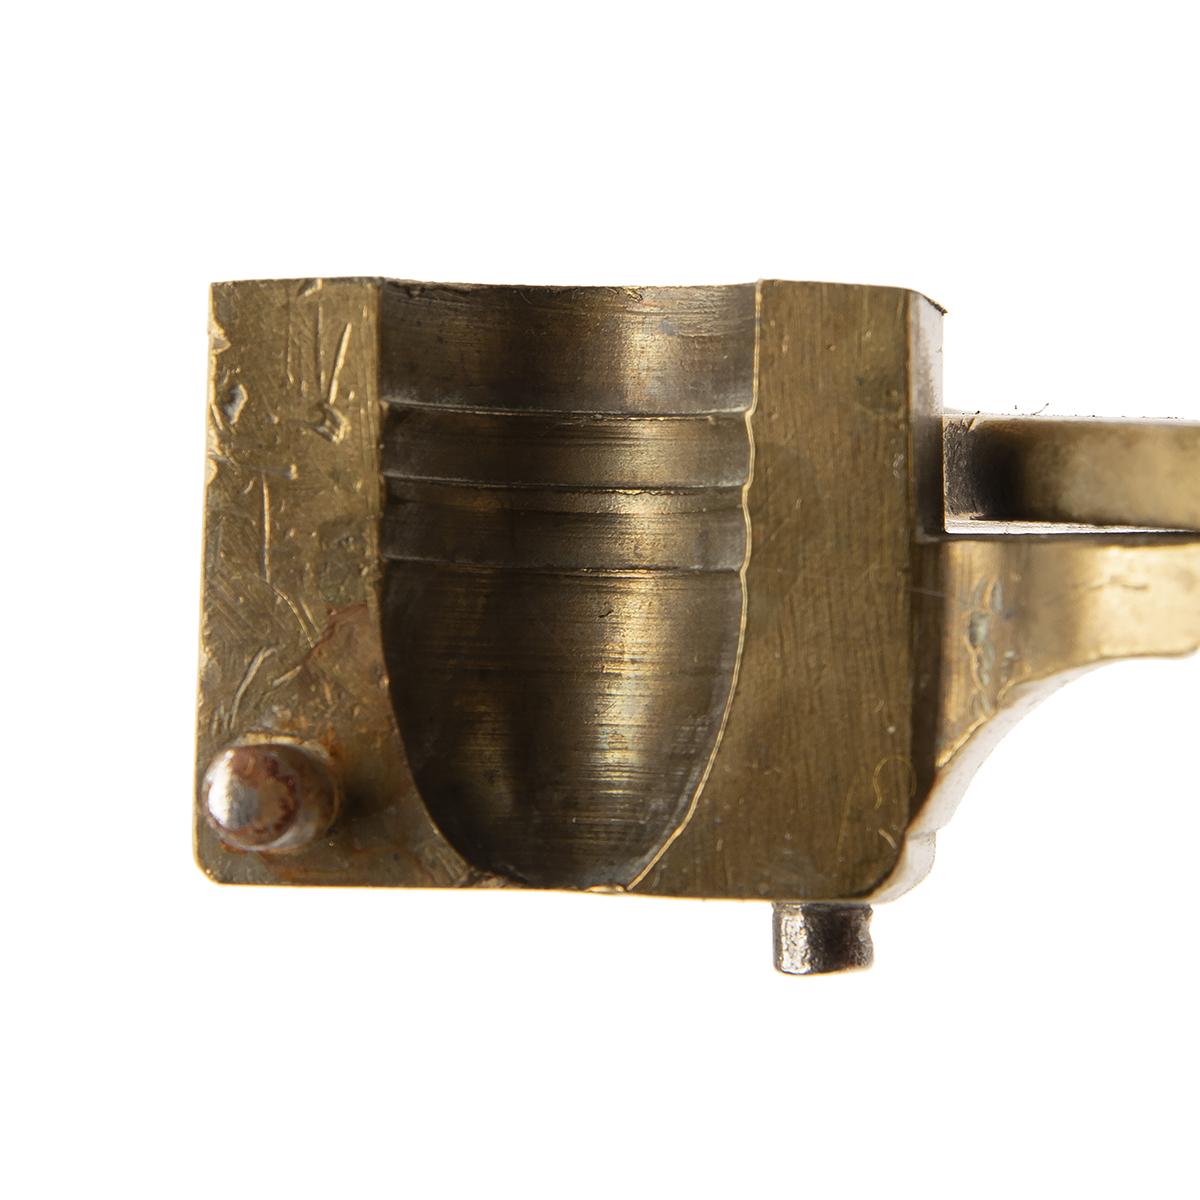 WILLIAM DAVIS, BIRMINGHAM A 14-BORE (.700) SINGLE-CAVITY BULLET-MOULD OF MINIE TYPE, of brass - Image 3 of 3